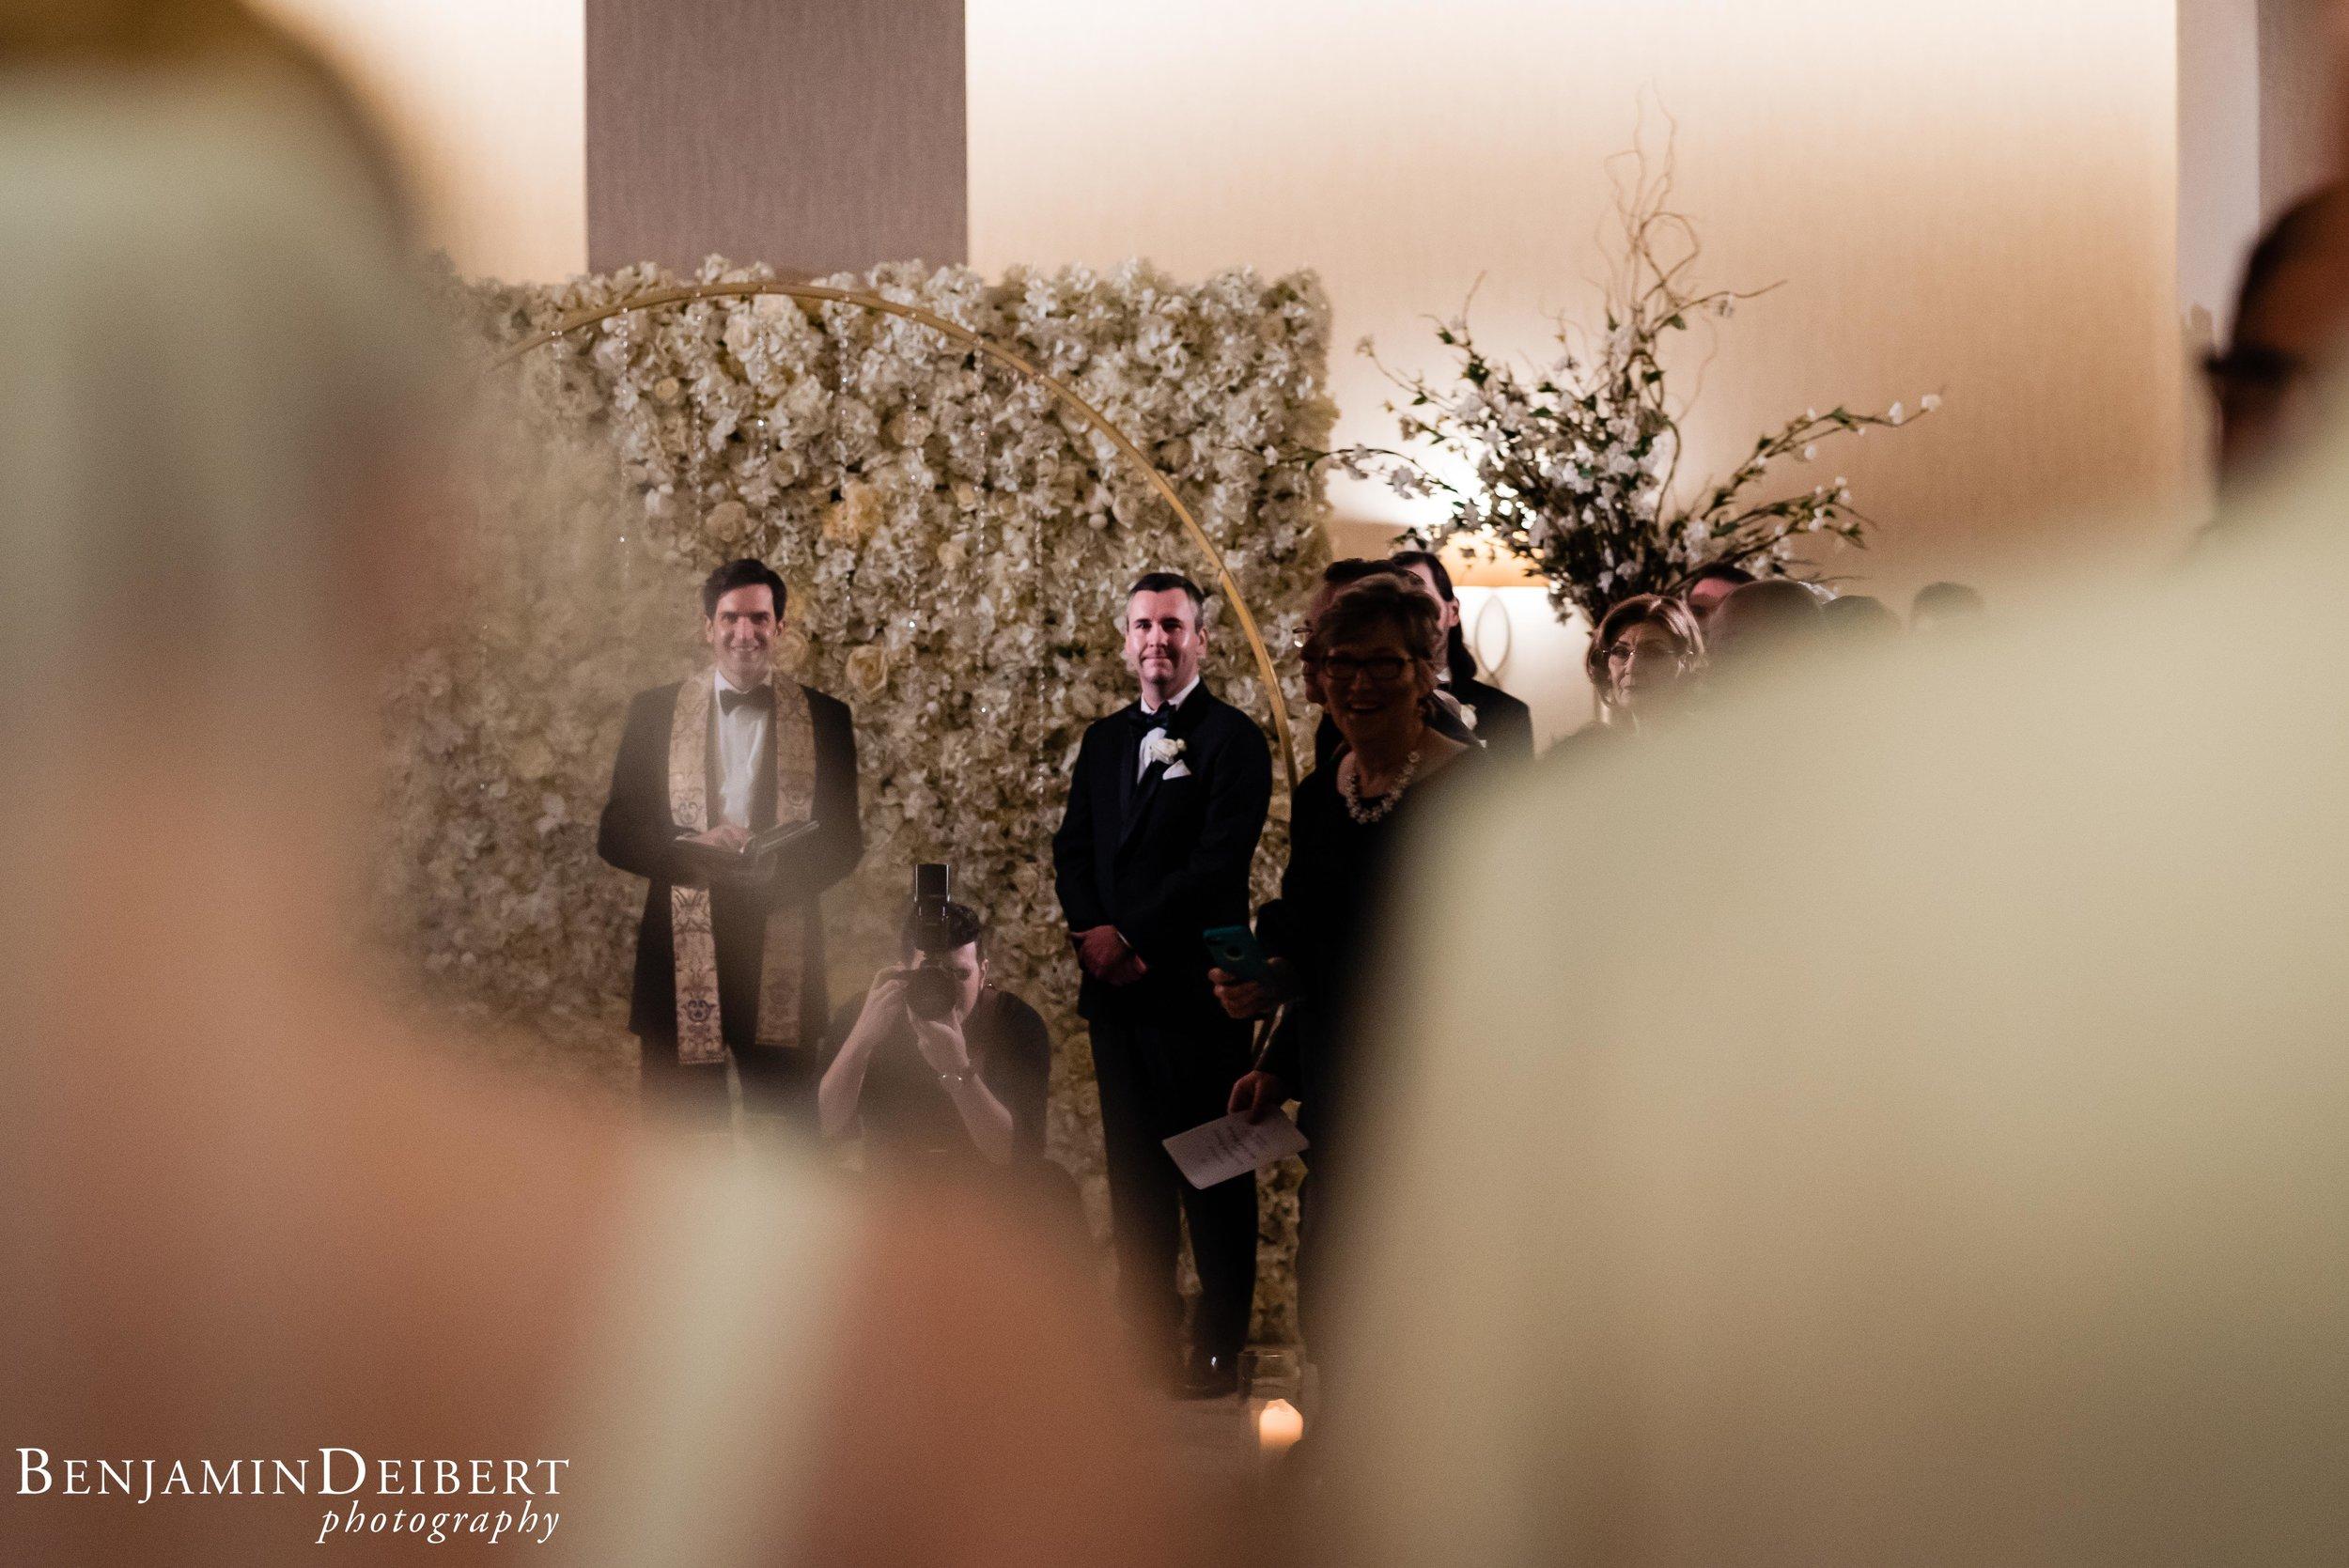 PatriceandAdam_TheLucy__Cescaphe_Wedding-27.jpg